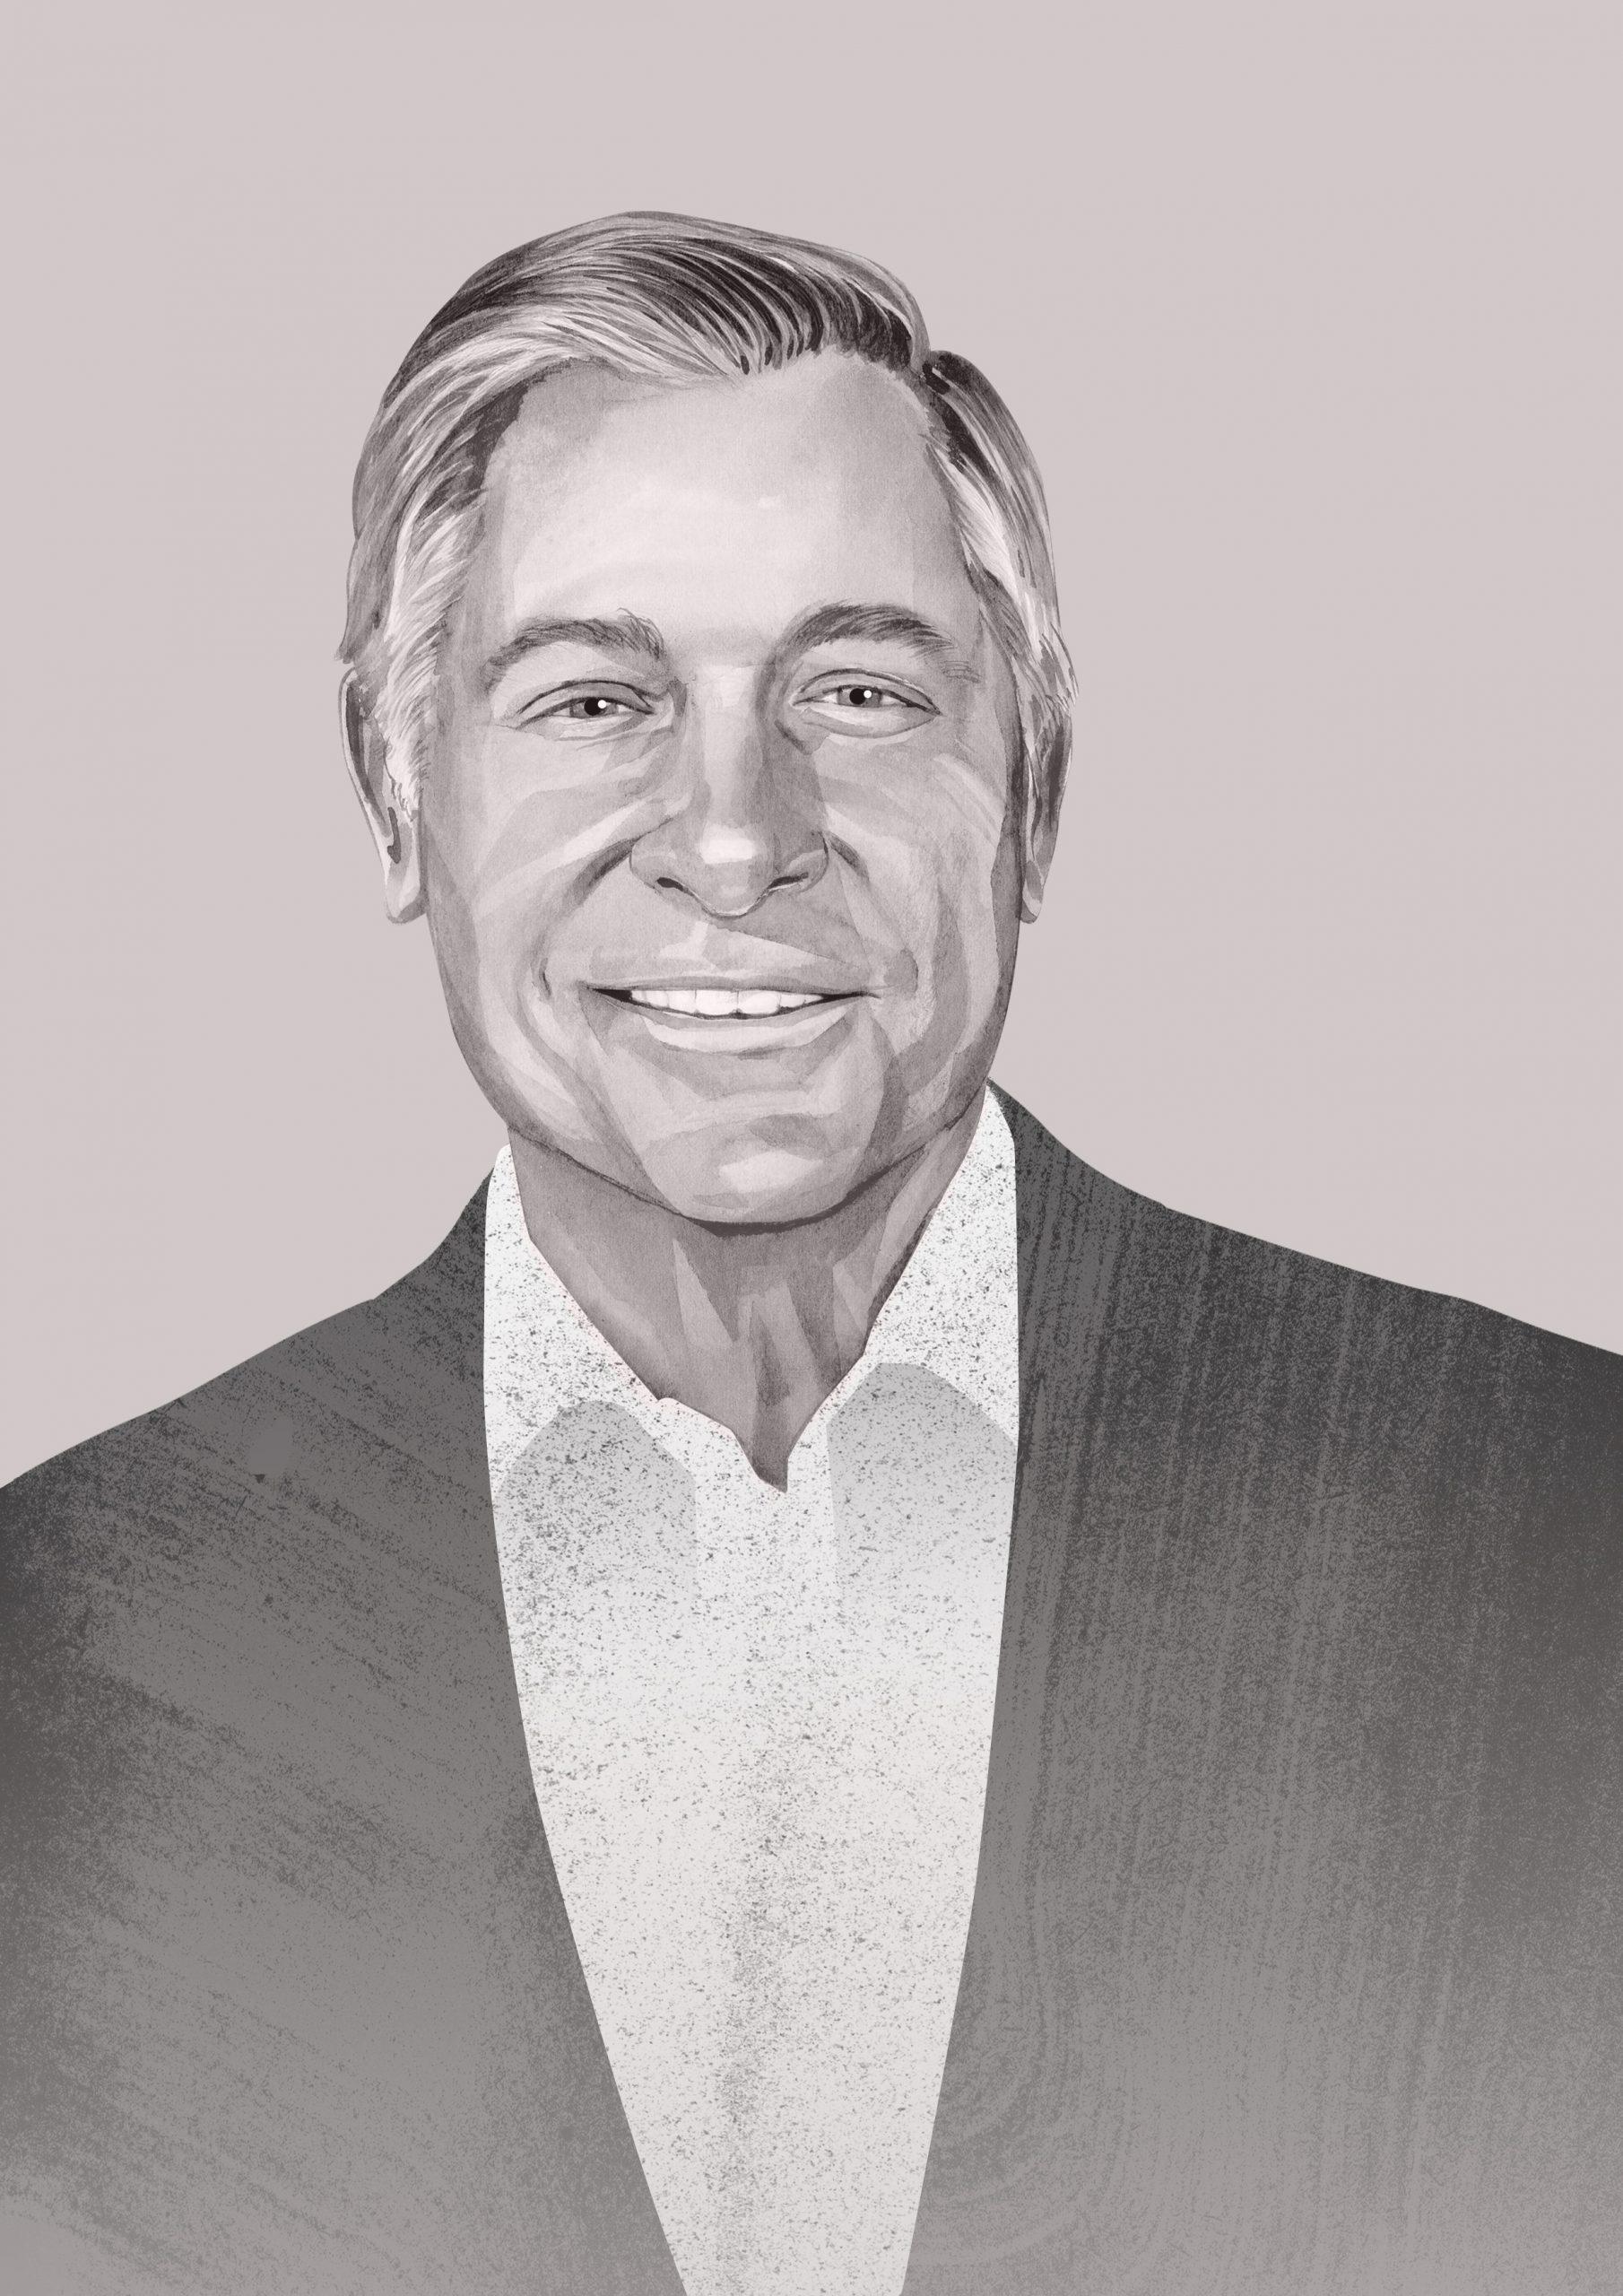 Bill Macatee